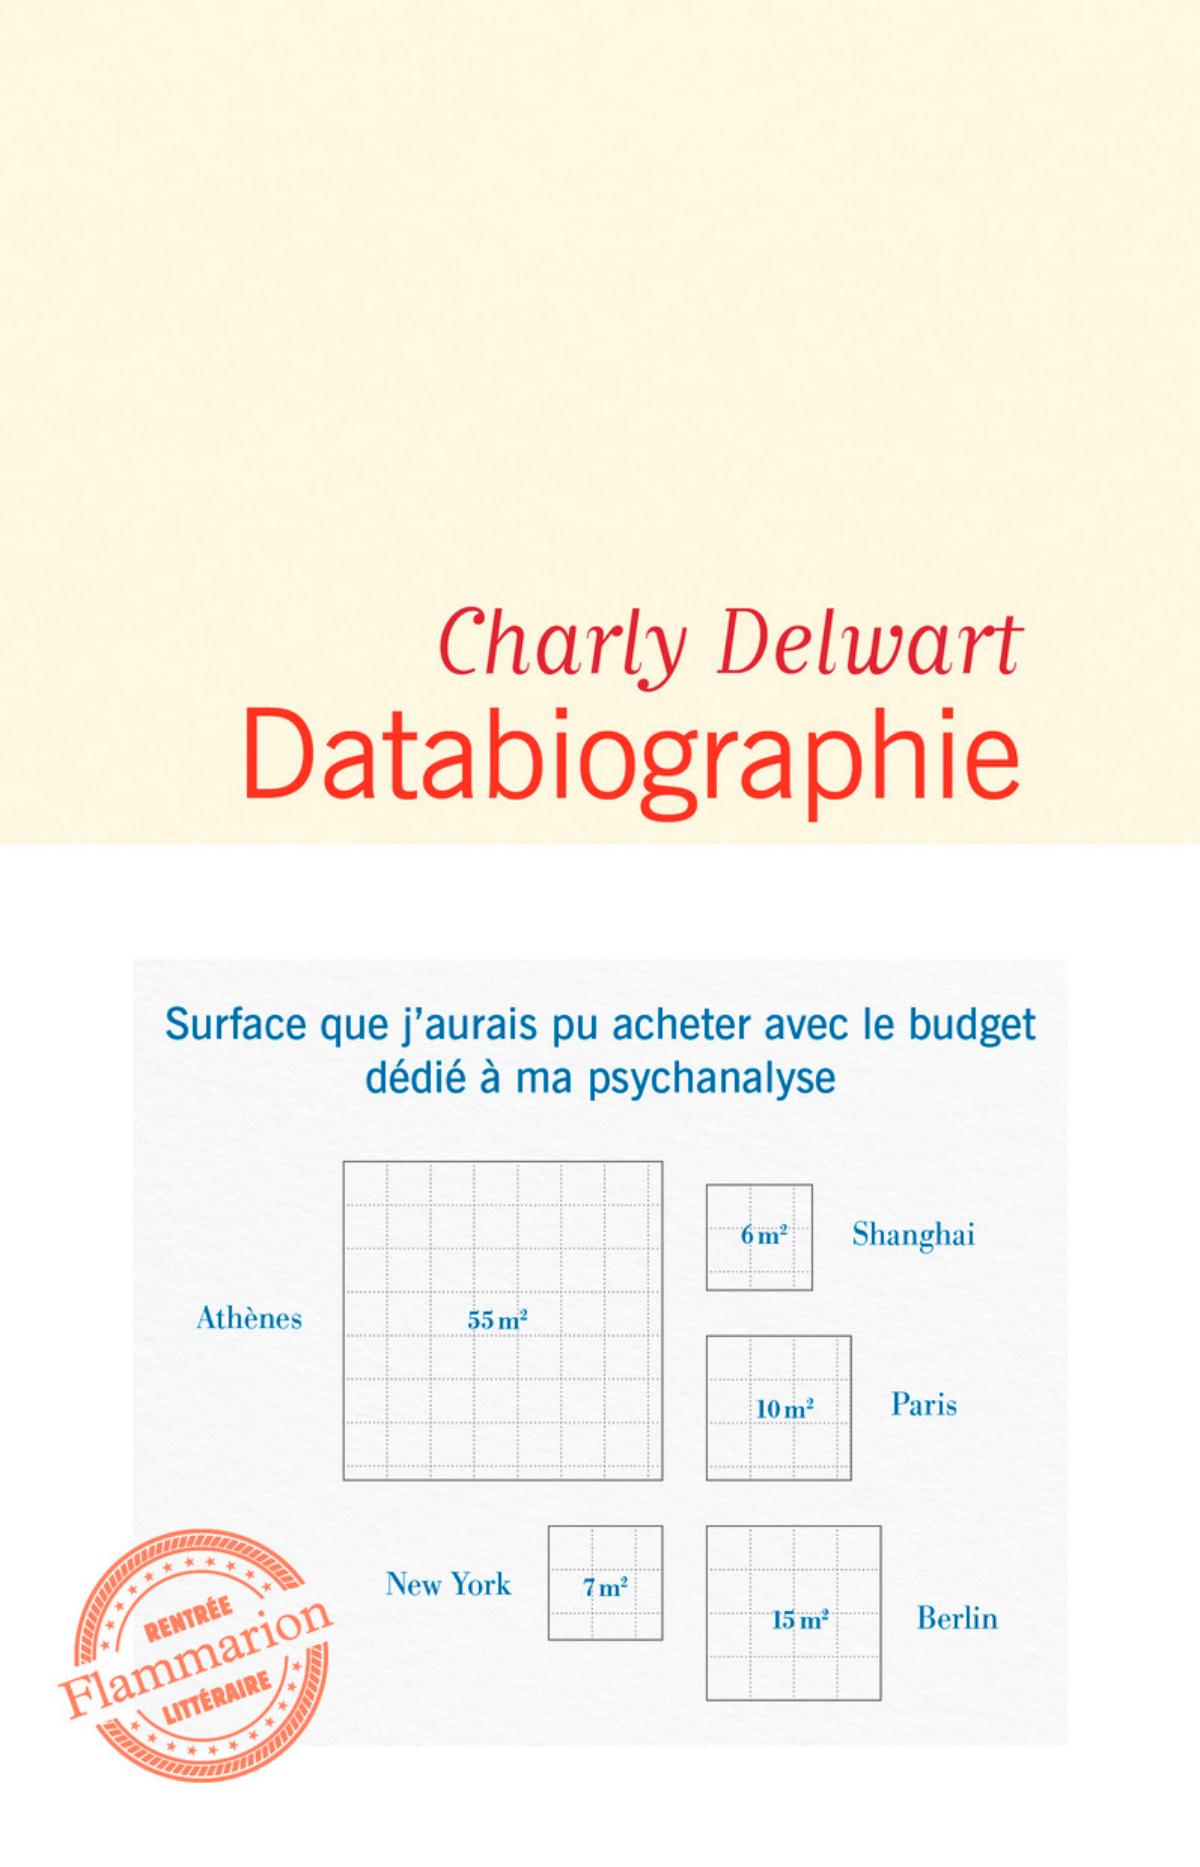 delwart-databiographie